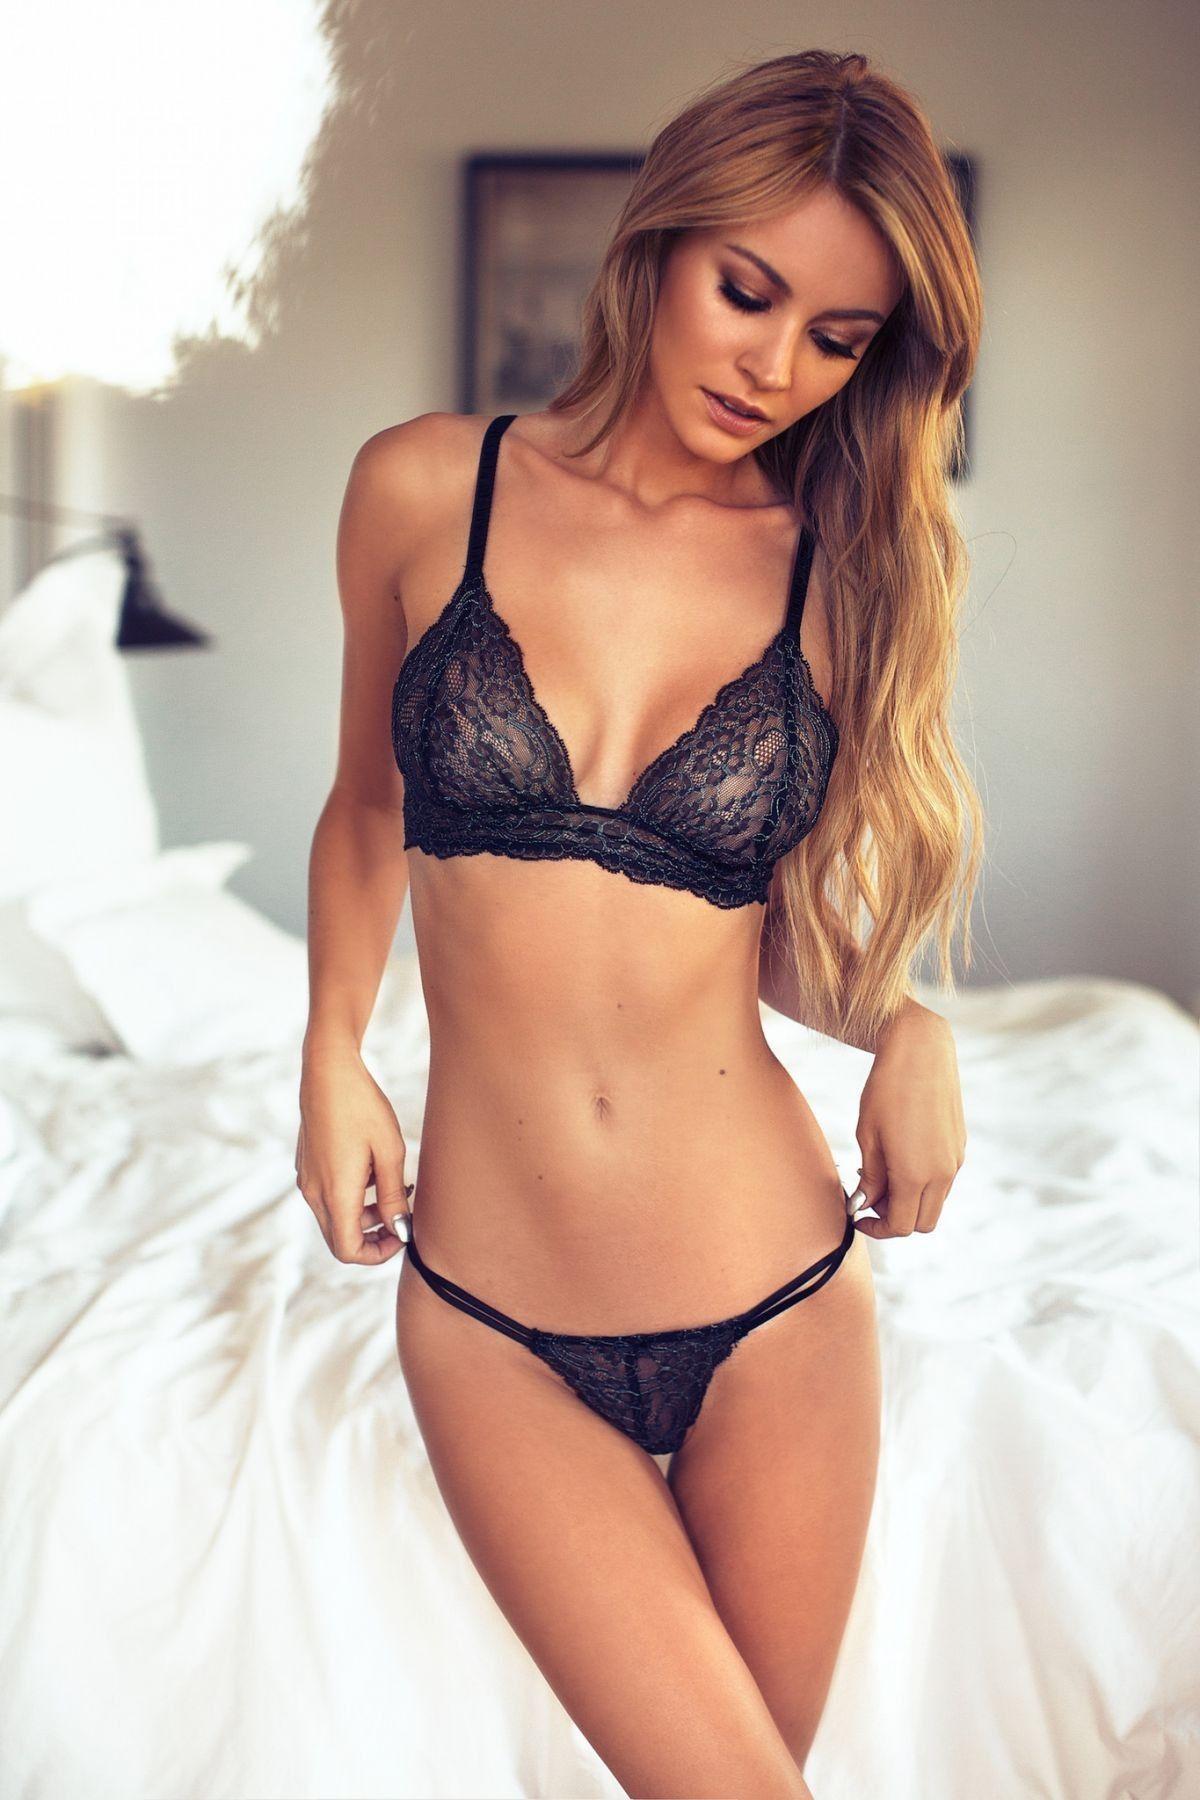 Bikini Panties Bryana Holly  nudes (19 photo), Twitter, legs